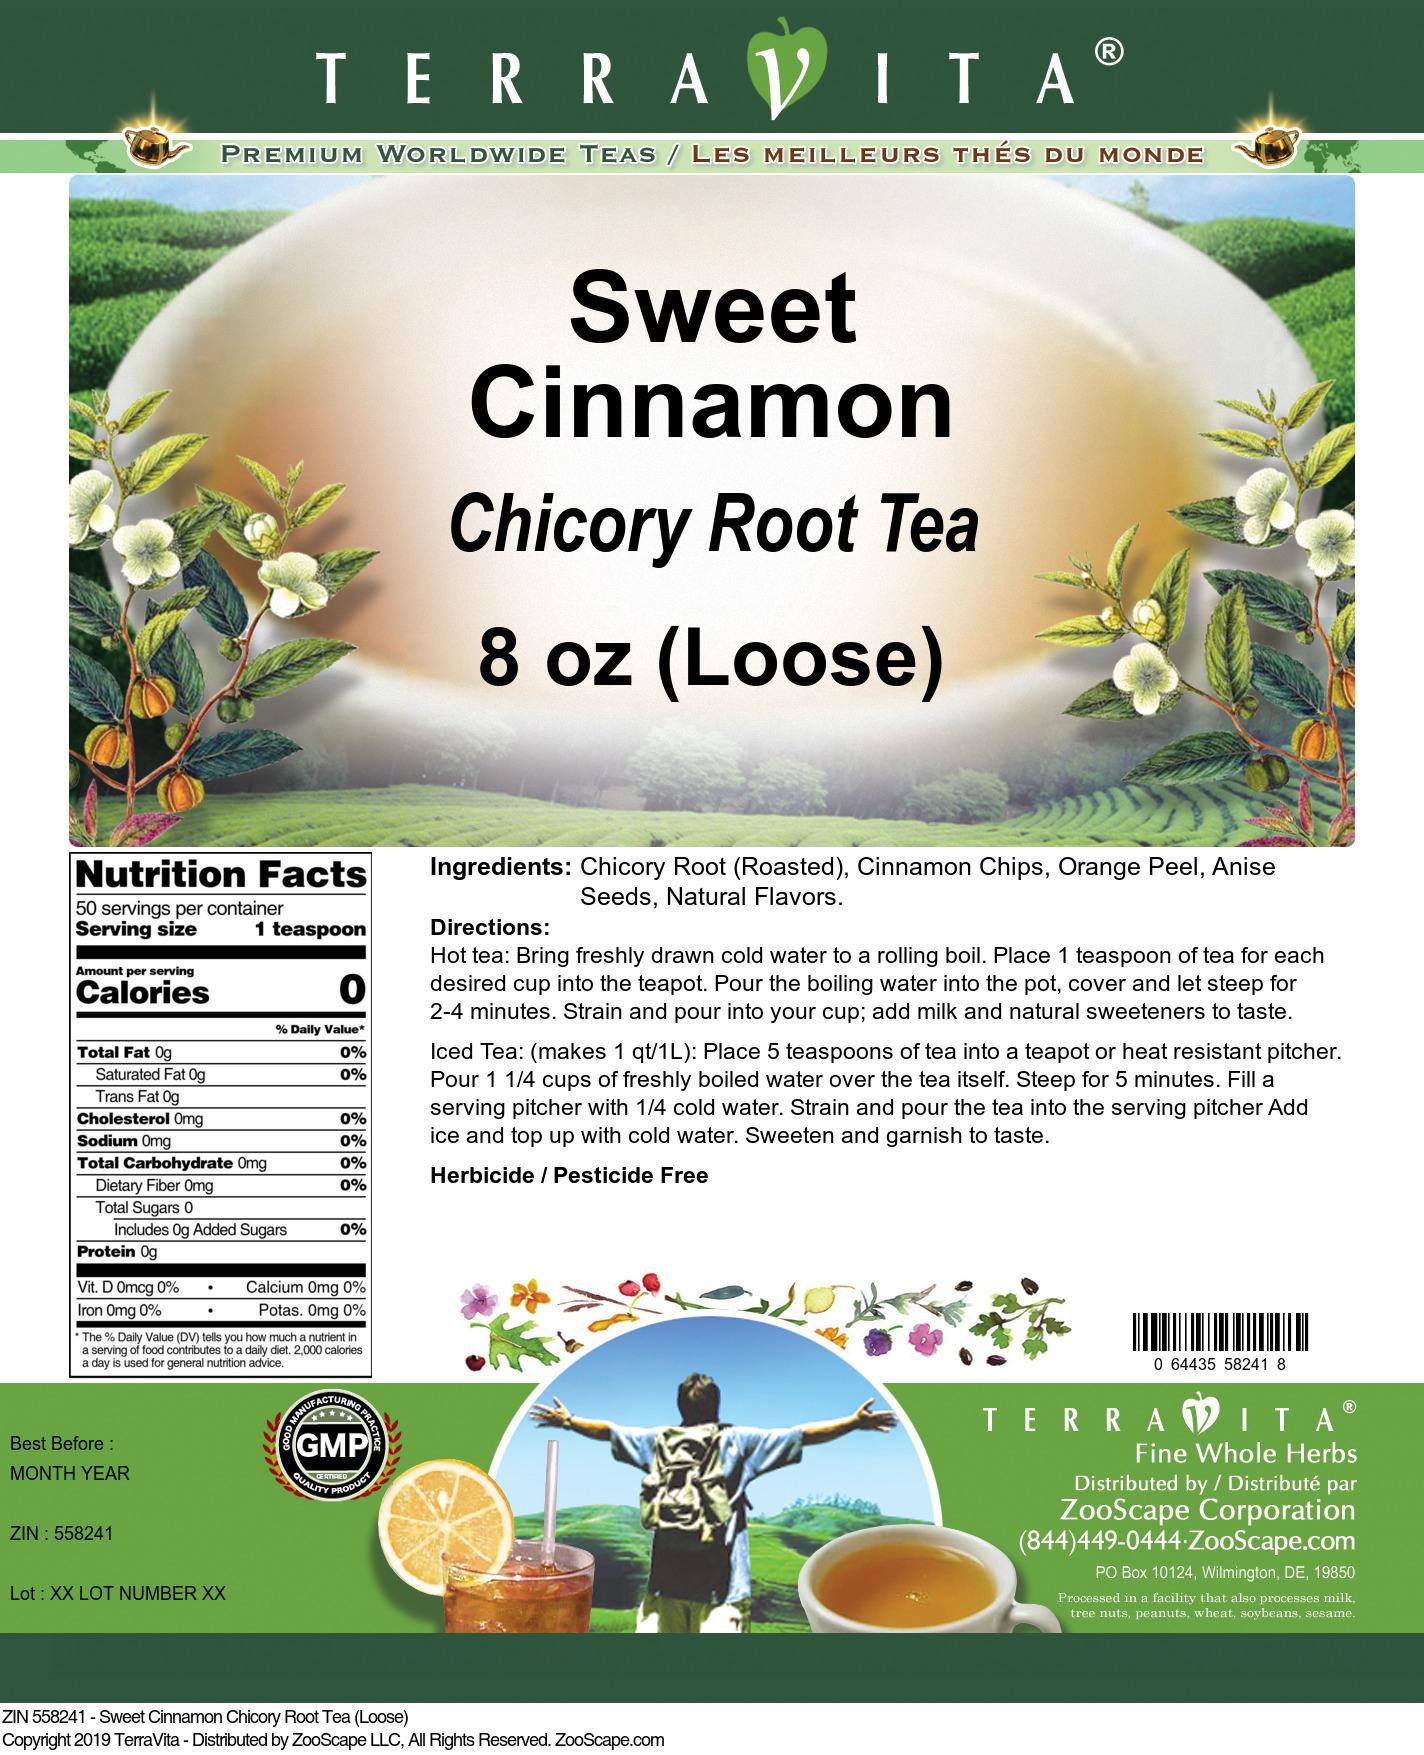 Sweet Cinnamon Chicory Root Tea (Loose)